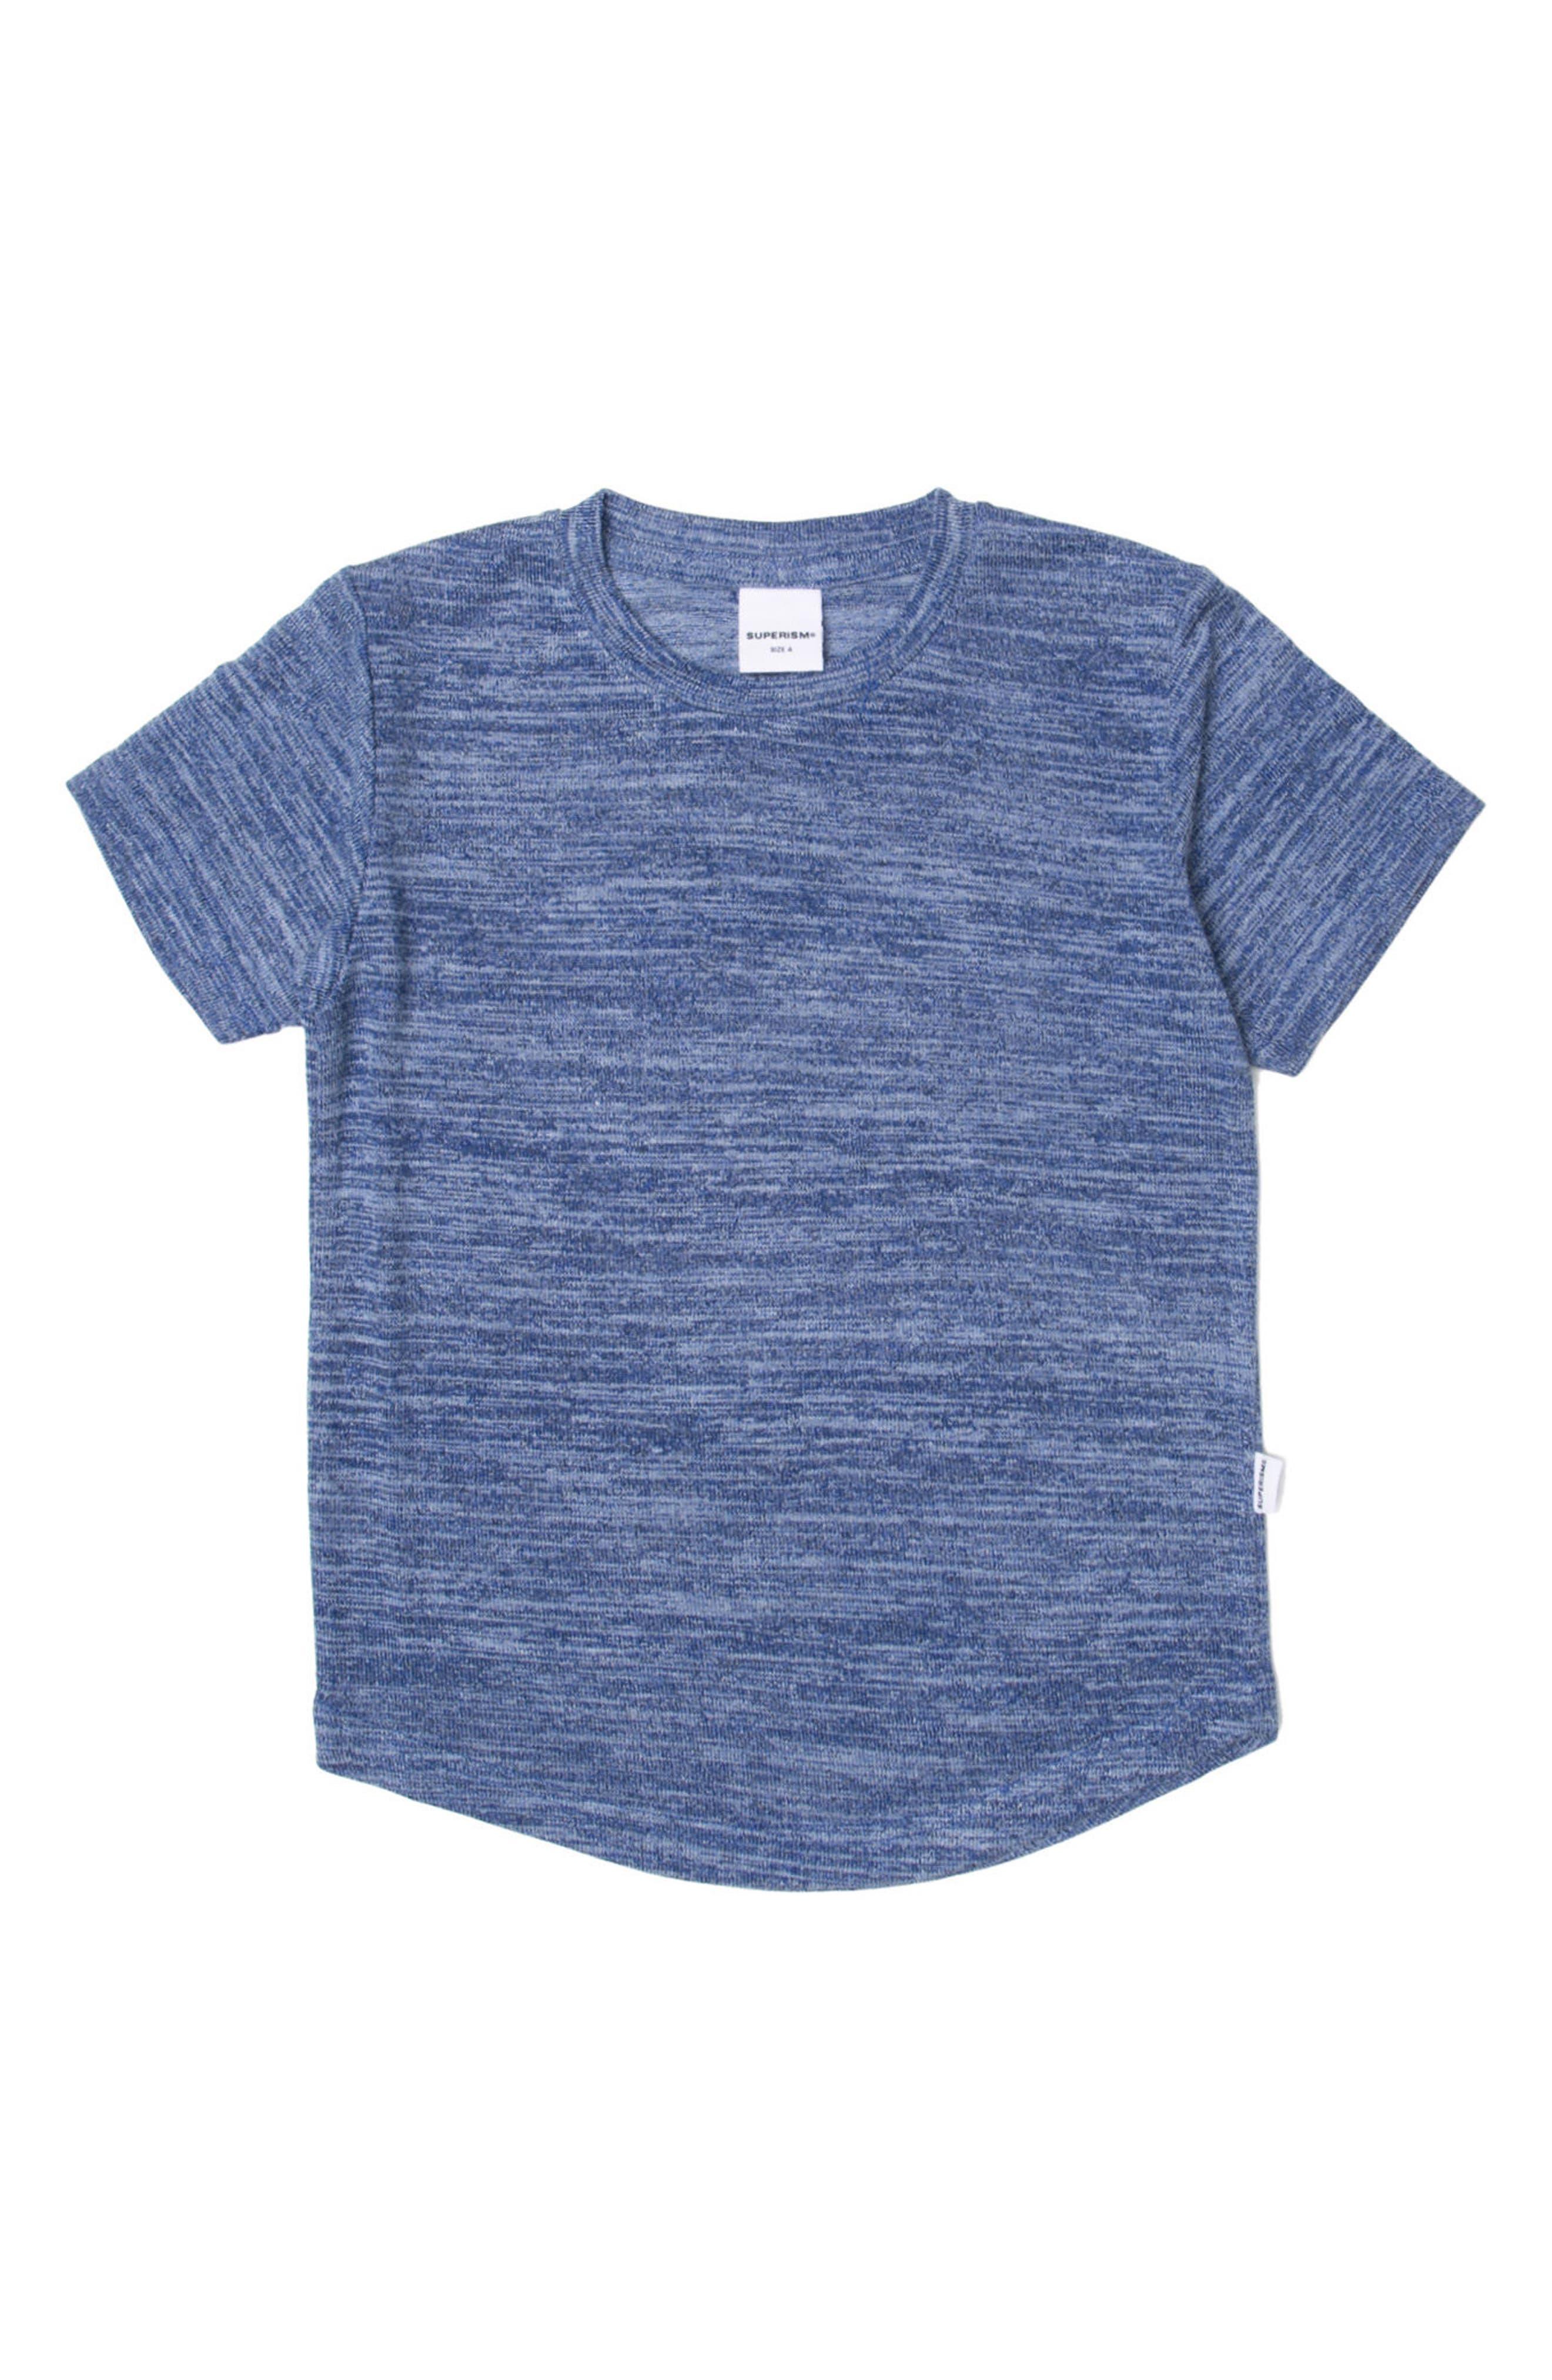 0c28ea0eb6b2e5 havaianas mens top mix navy blue mineral blue flip flops ic clothing ...